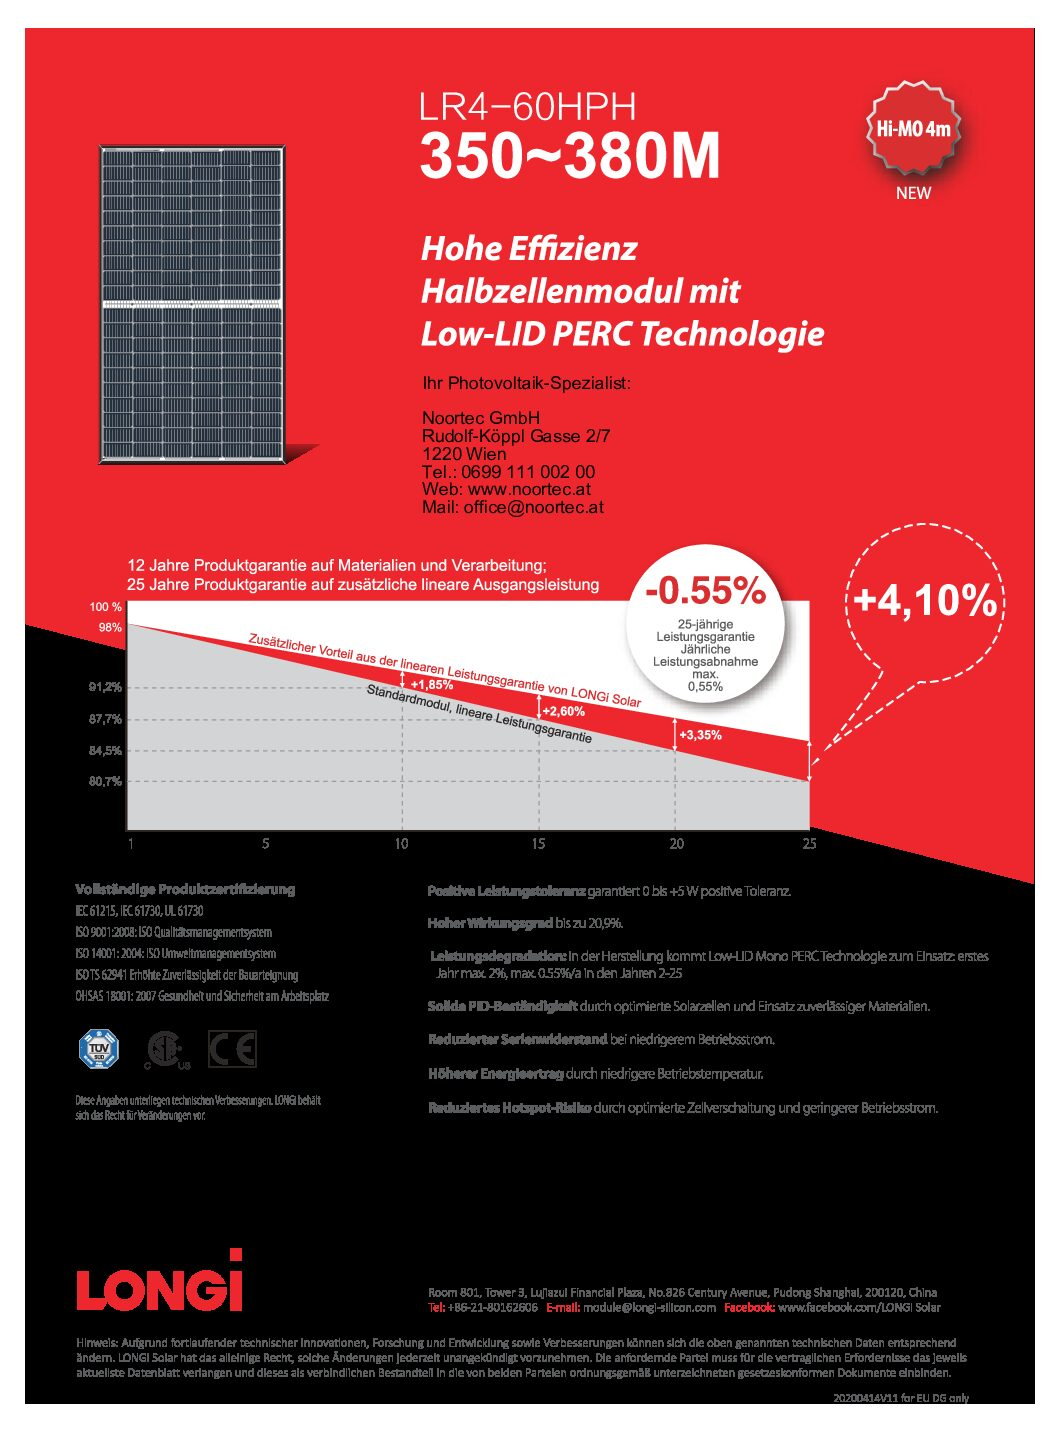 photovoltaik modul datenblatt longi lr4 60hph 350 380m pdf